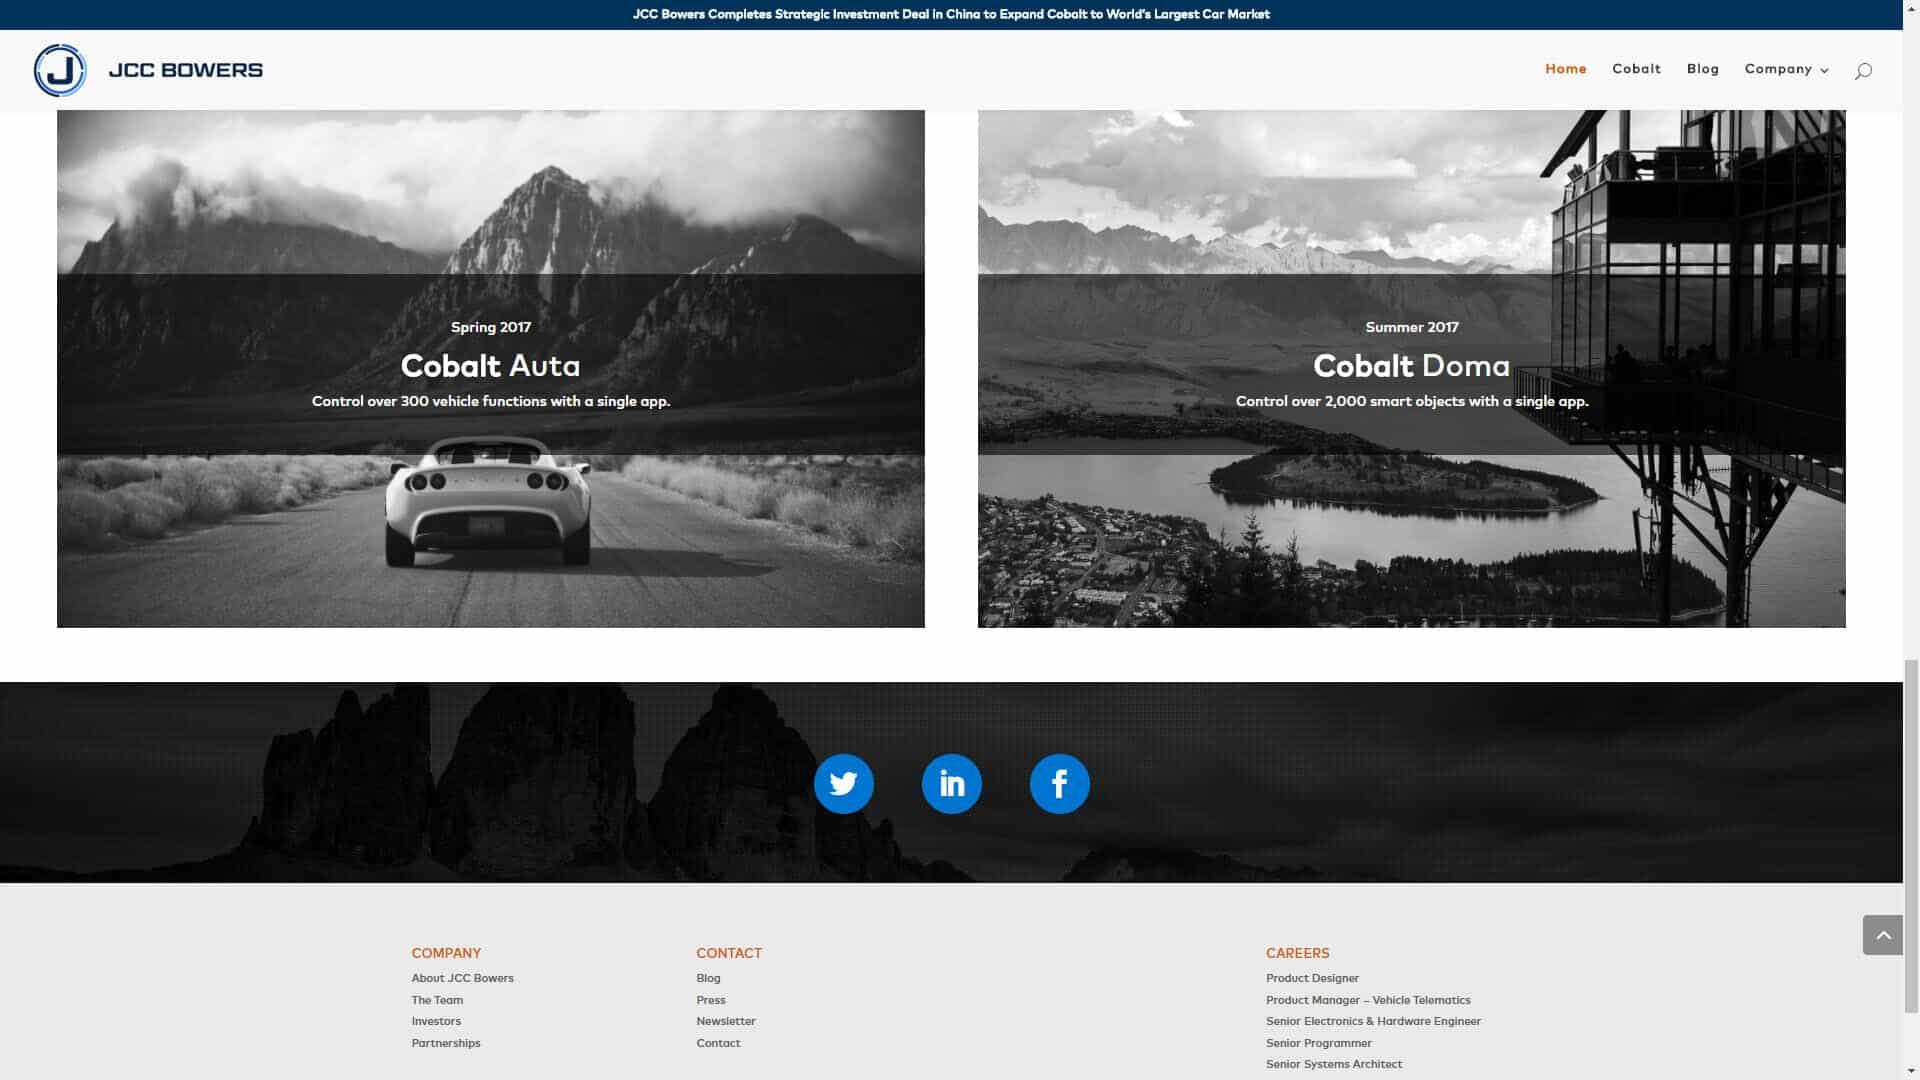 JCC Bowers - Corporate Website Design